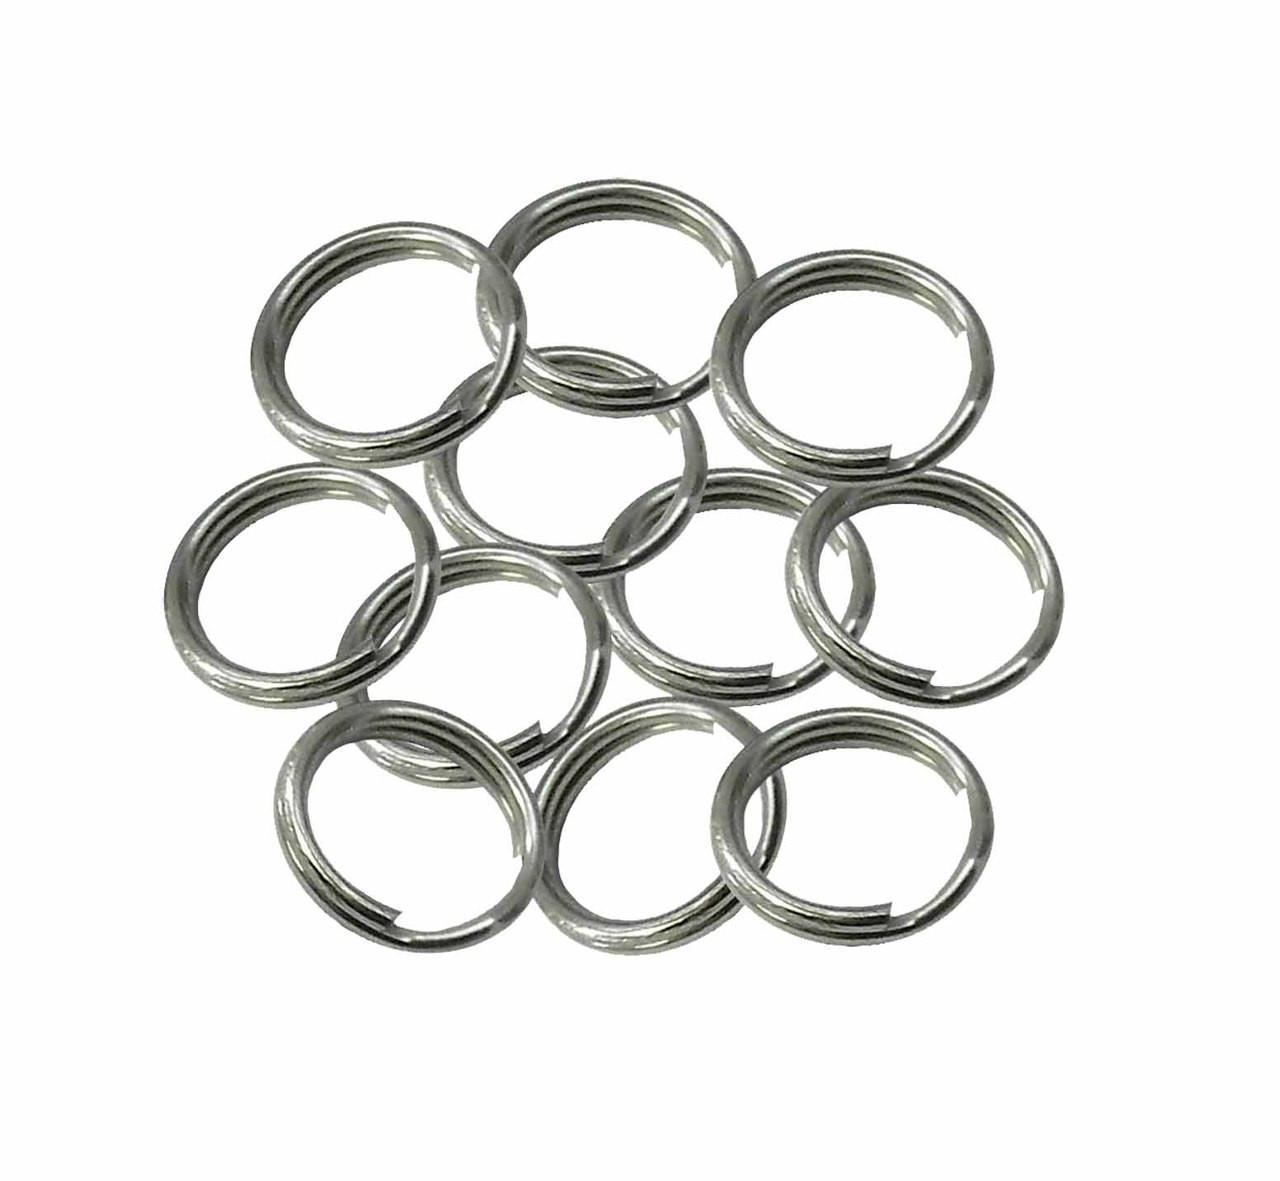 Lot Of 200 Split Key Rings 19Mm 3//4 Inch Nickel Plated Steel